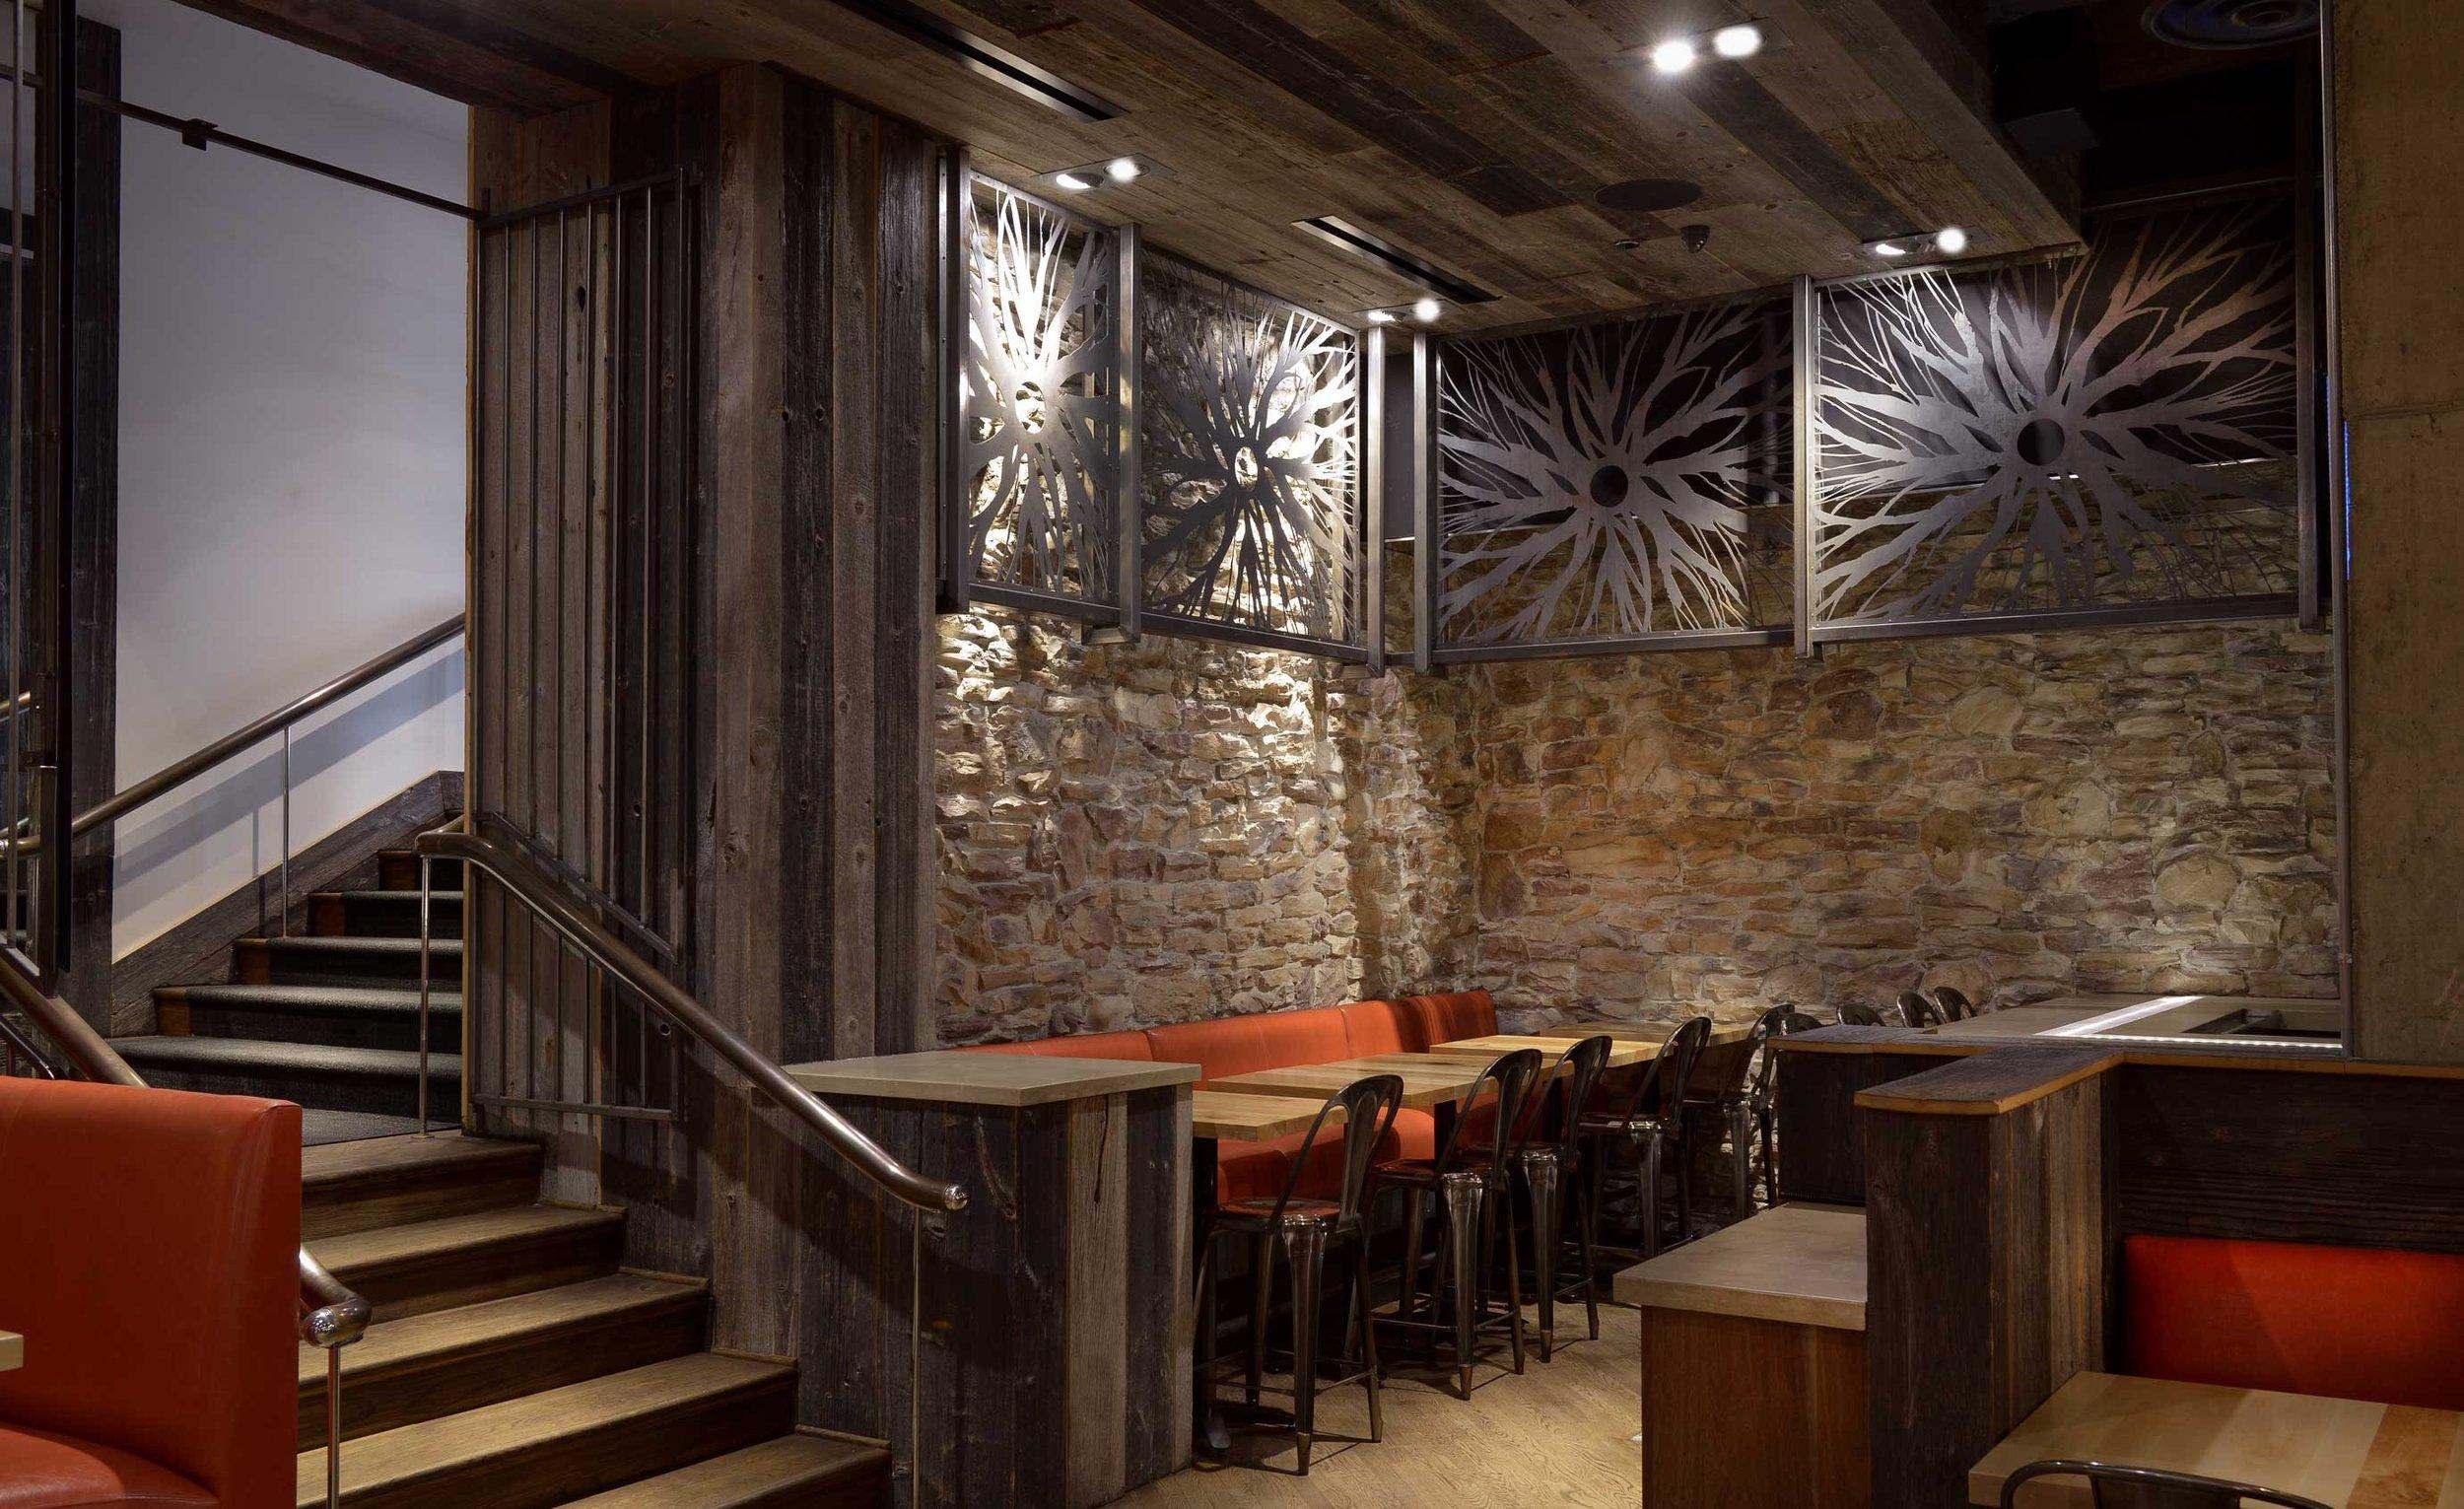 studio-saint-bars-and-restaurants-boveda-washington-dc-7